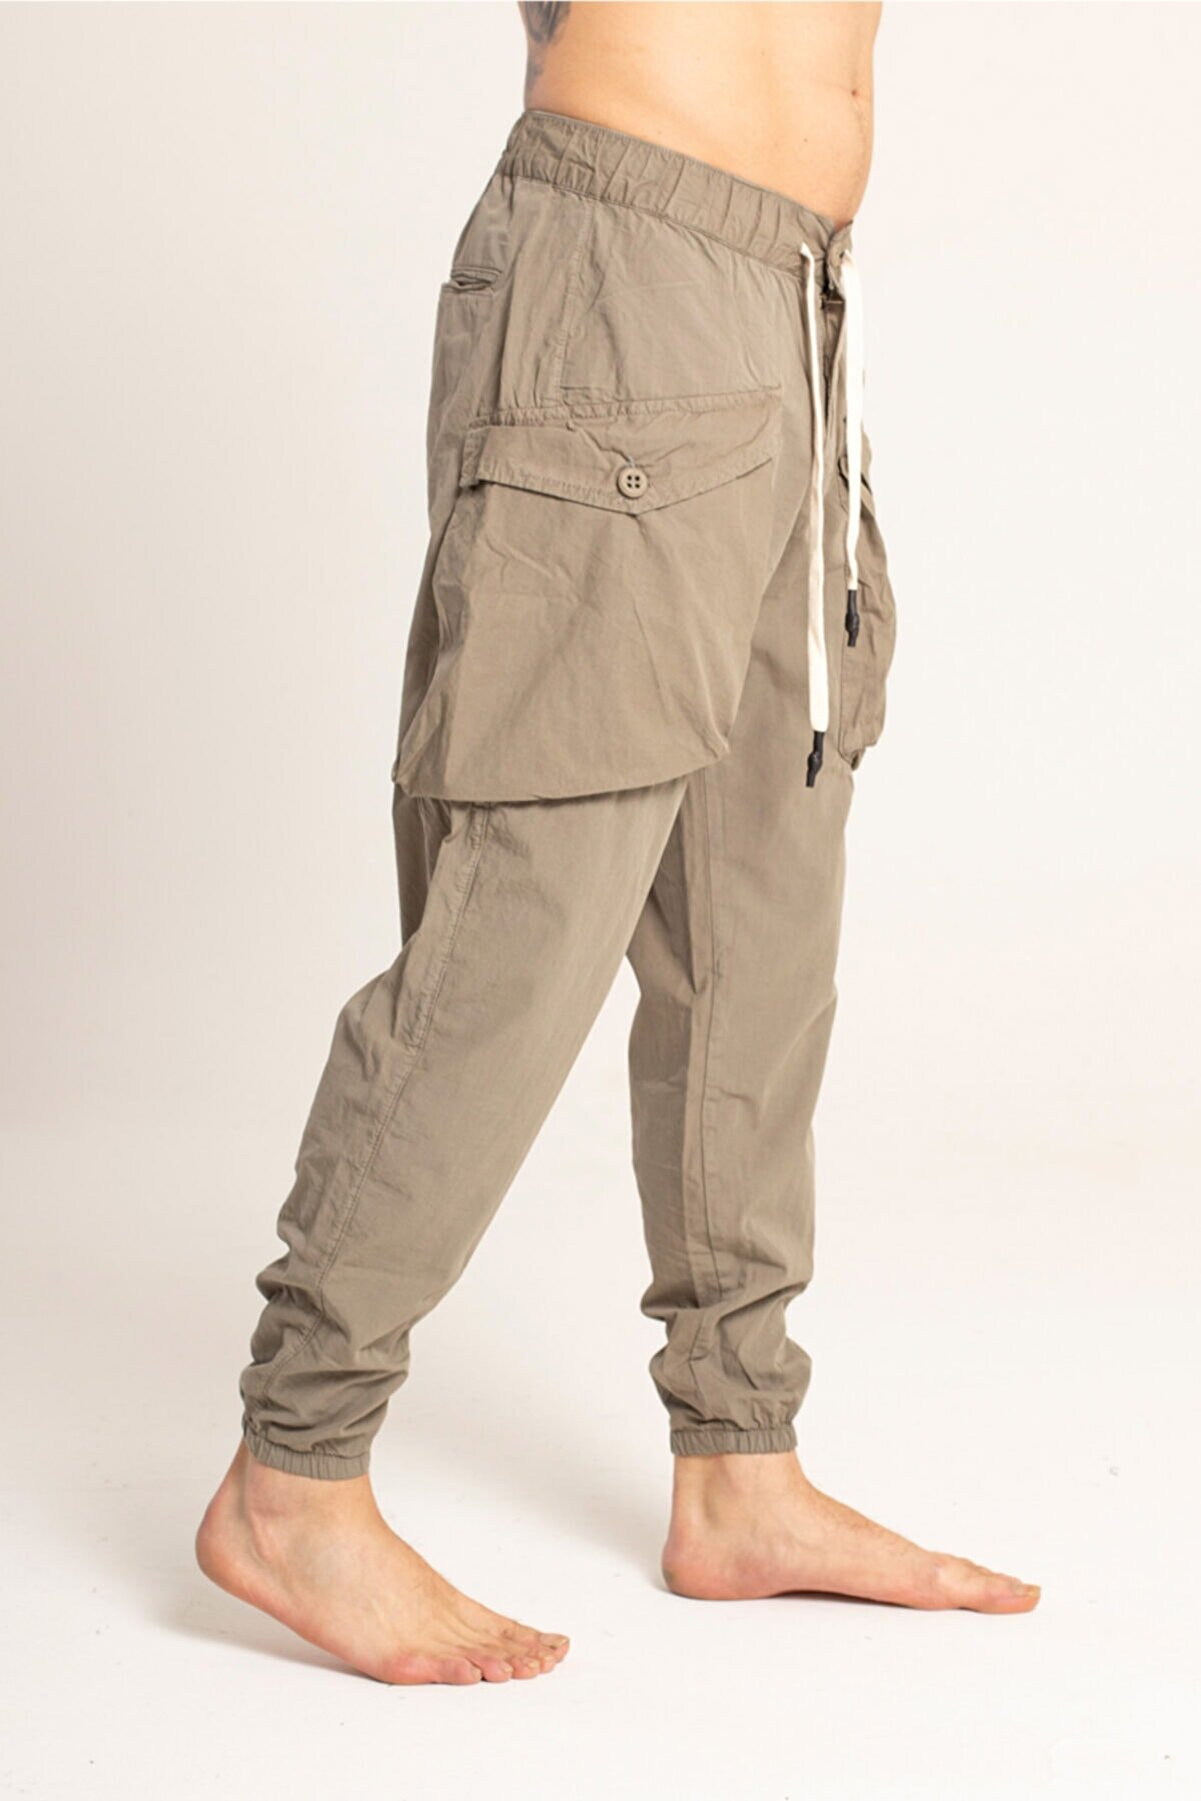 Catch Erkek Haki Jogger Pantolon 3944-g